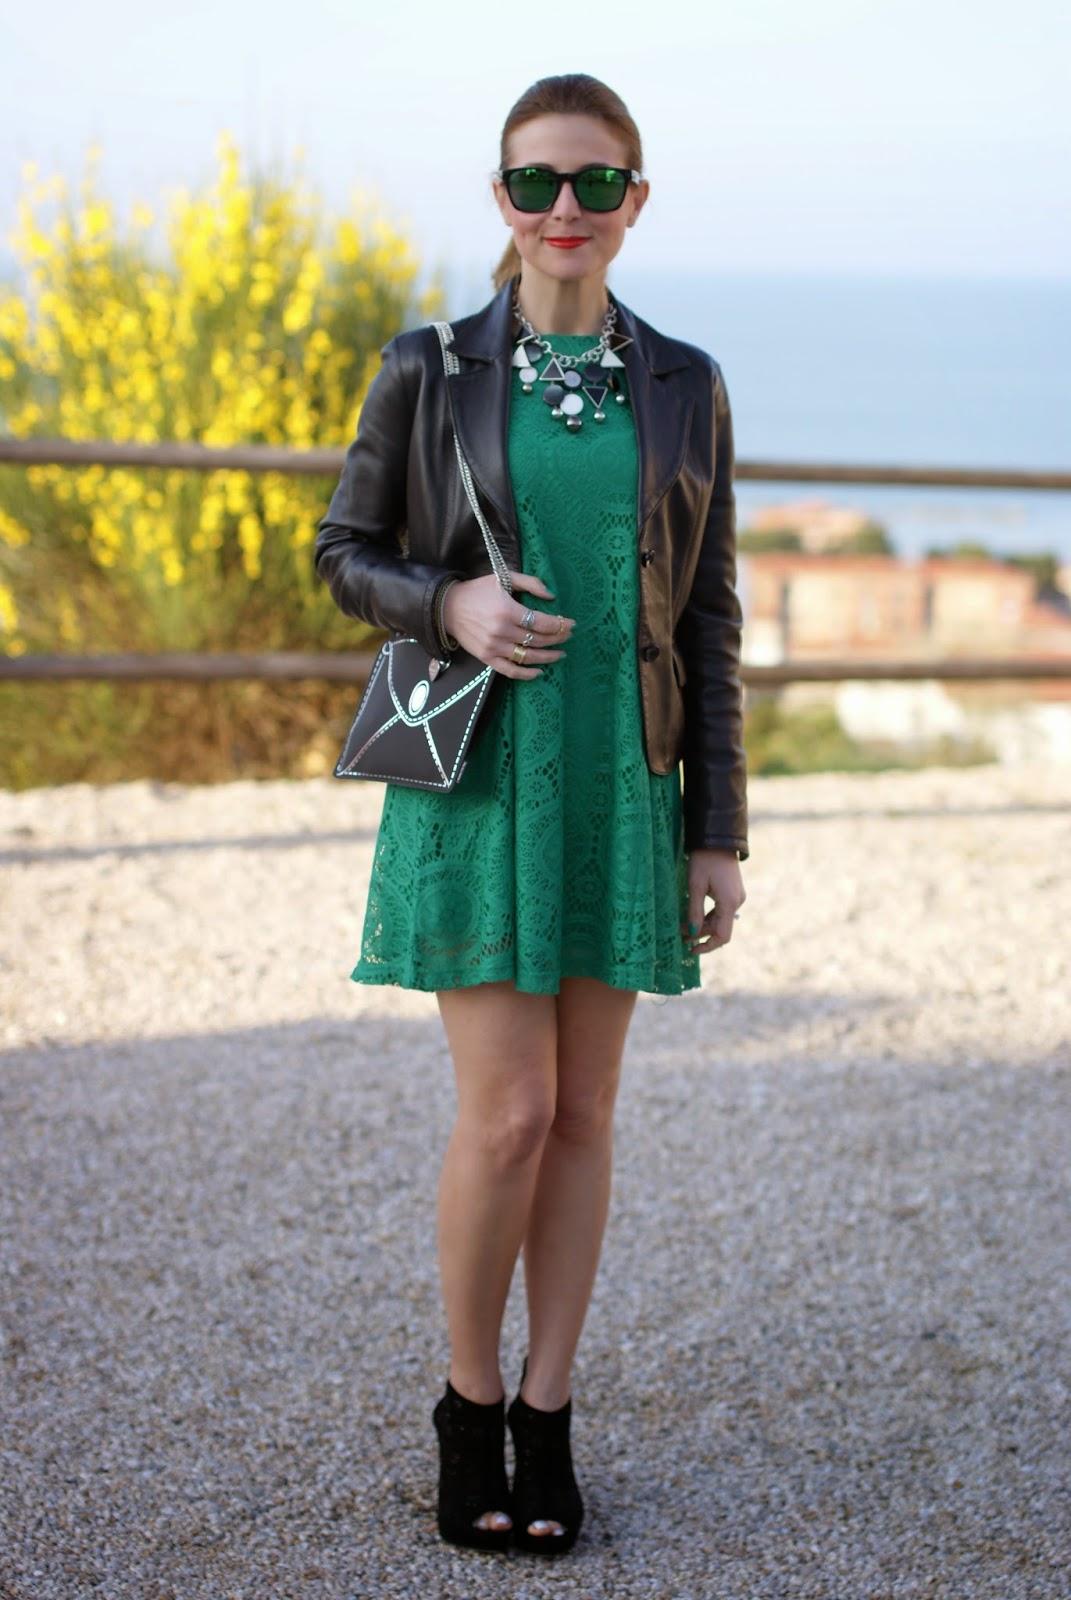 Vitti Ferria Contin jewelry, Millelire watch, Sheinside green dress, Fashion and Cookies, fashion blogger